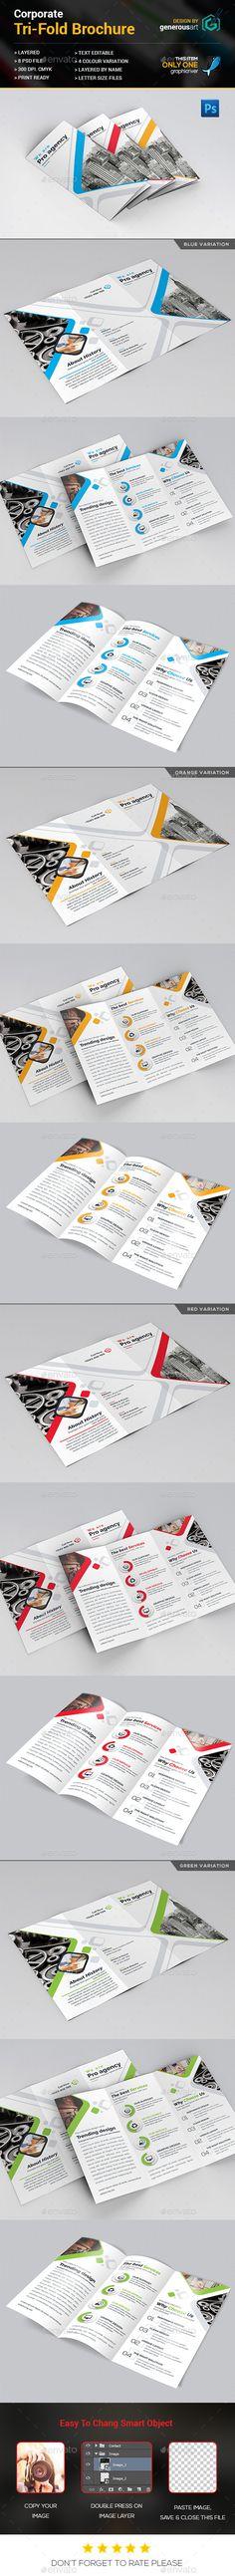 Multi-purpose Tri-Fold Brochure Template PSD. Download here: http://graphicriver.net/item/multipurpose-trifold-brochure/16182085?ref=ksioks